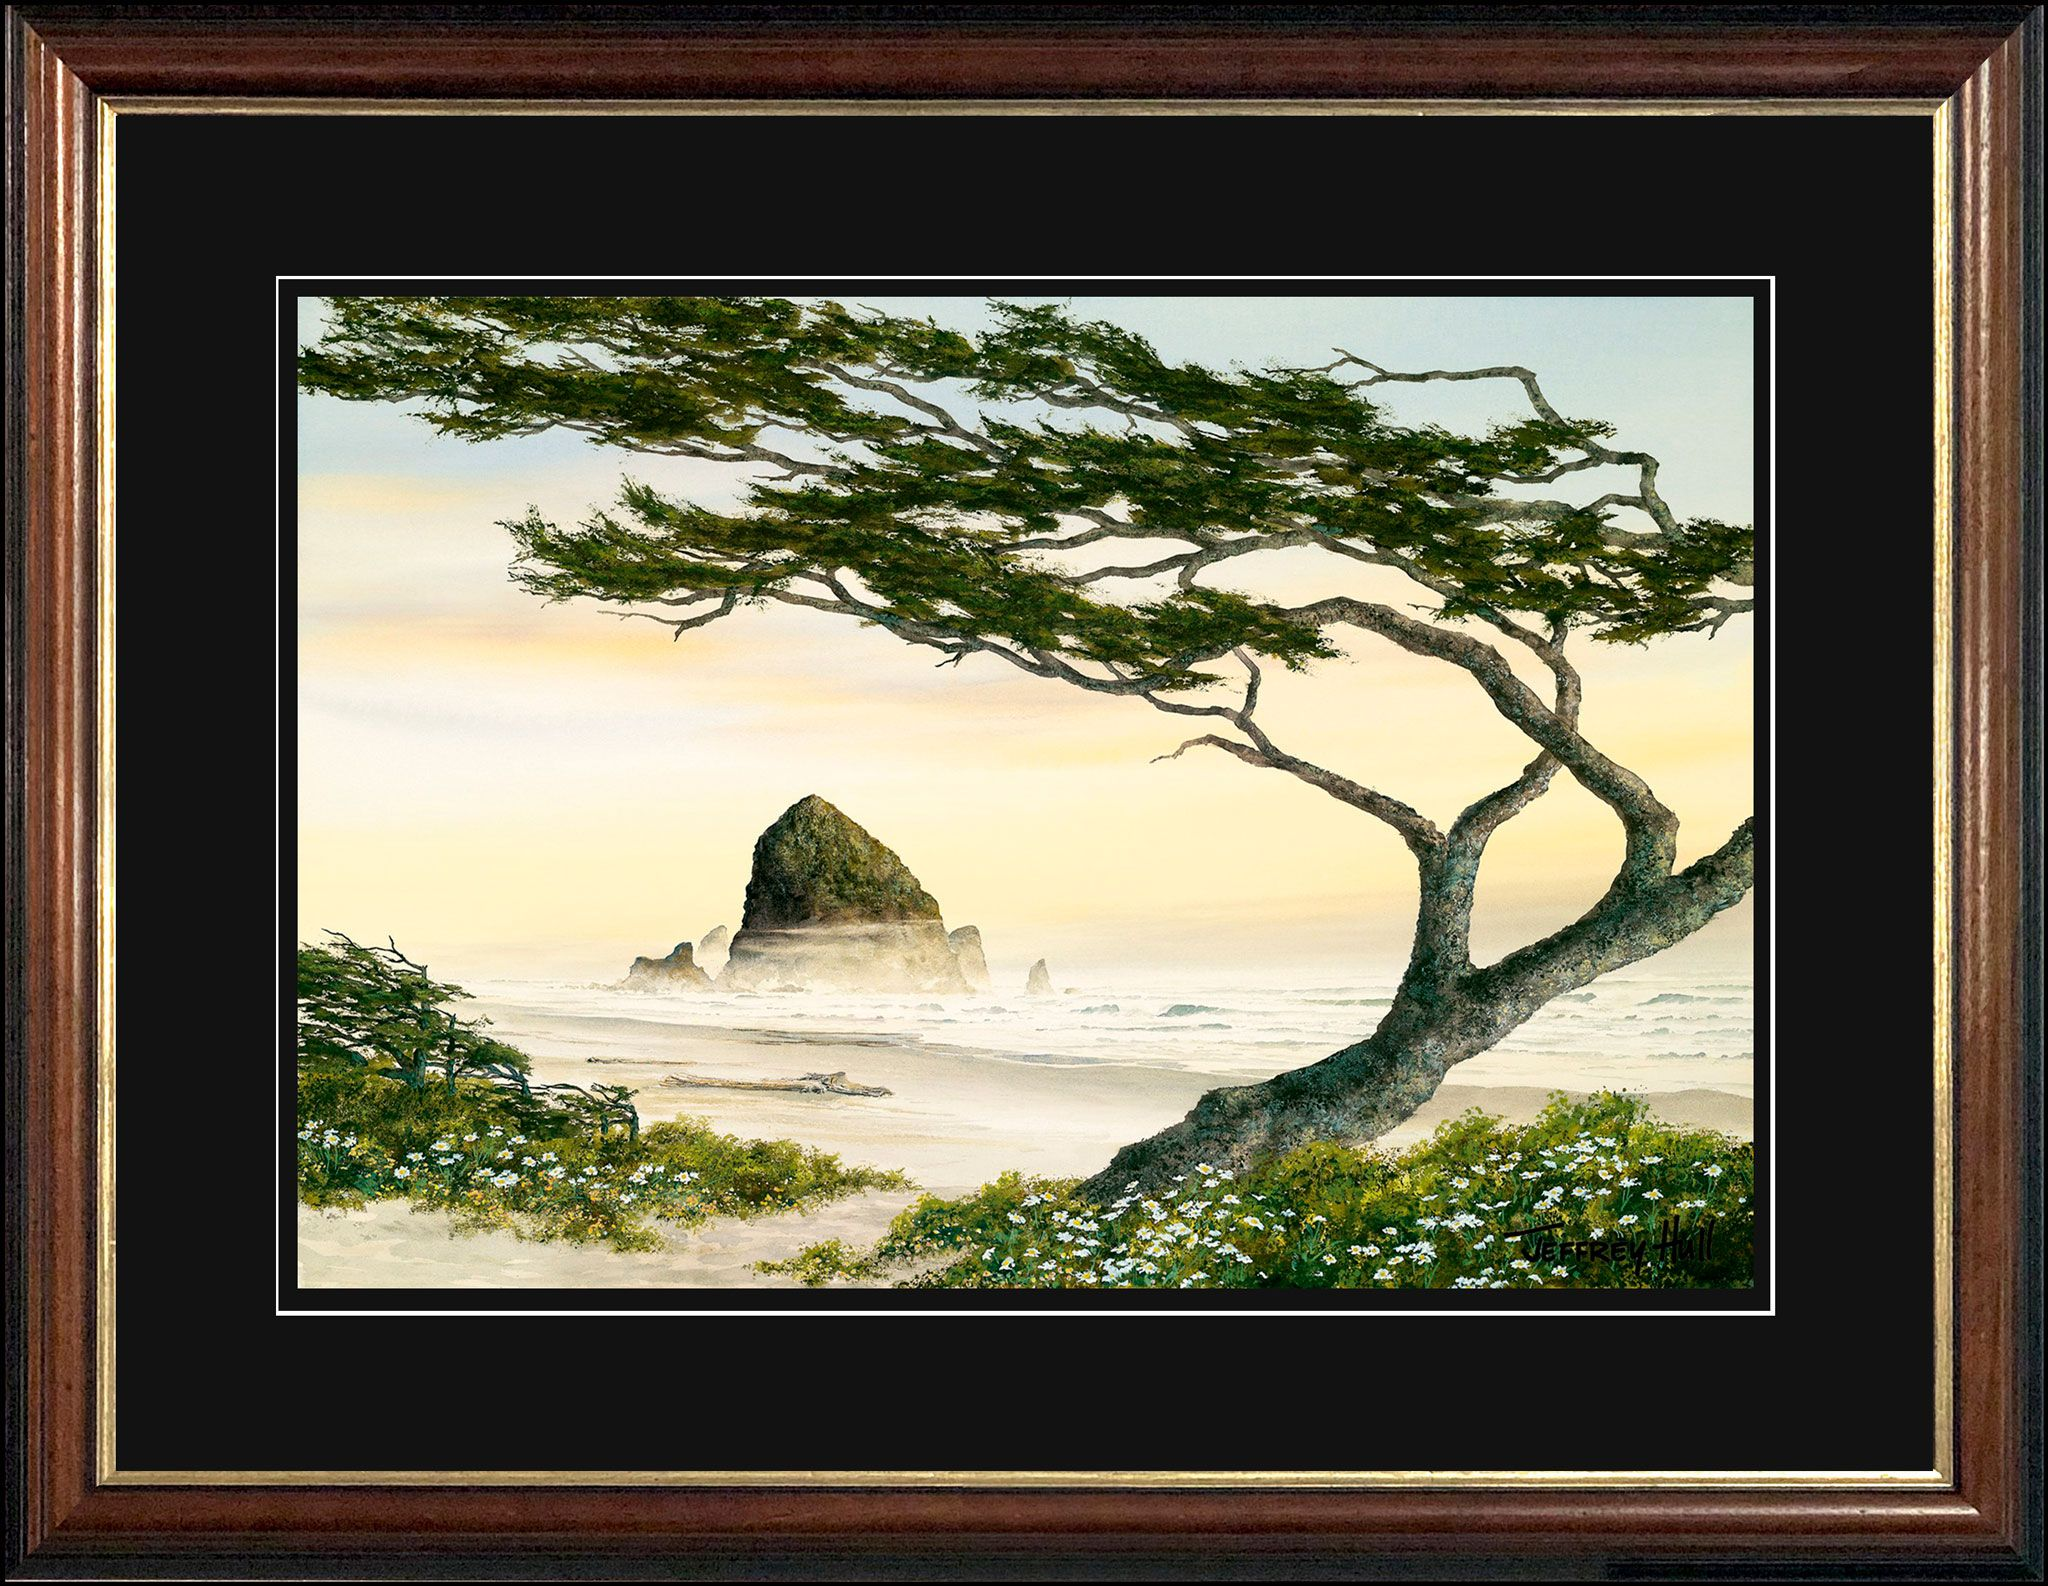 The-Wedding-Tree-LimEd-Malabar-Jet-Black-4-Website-2021